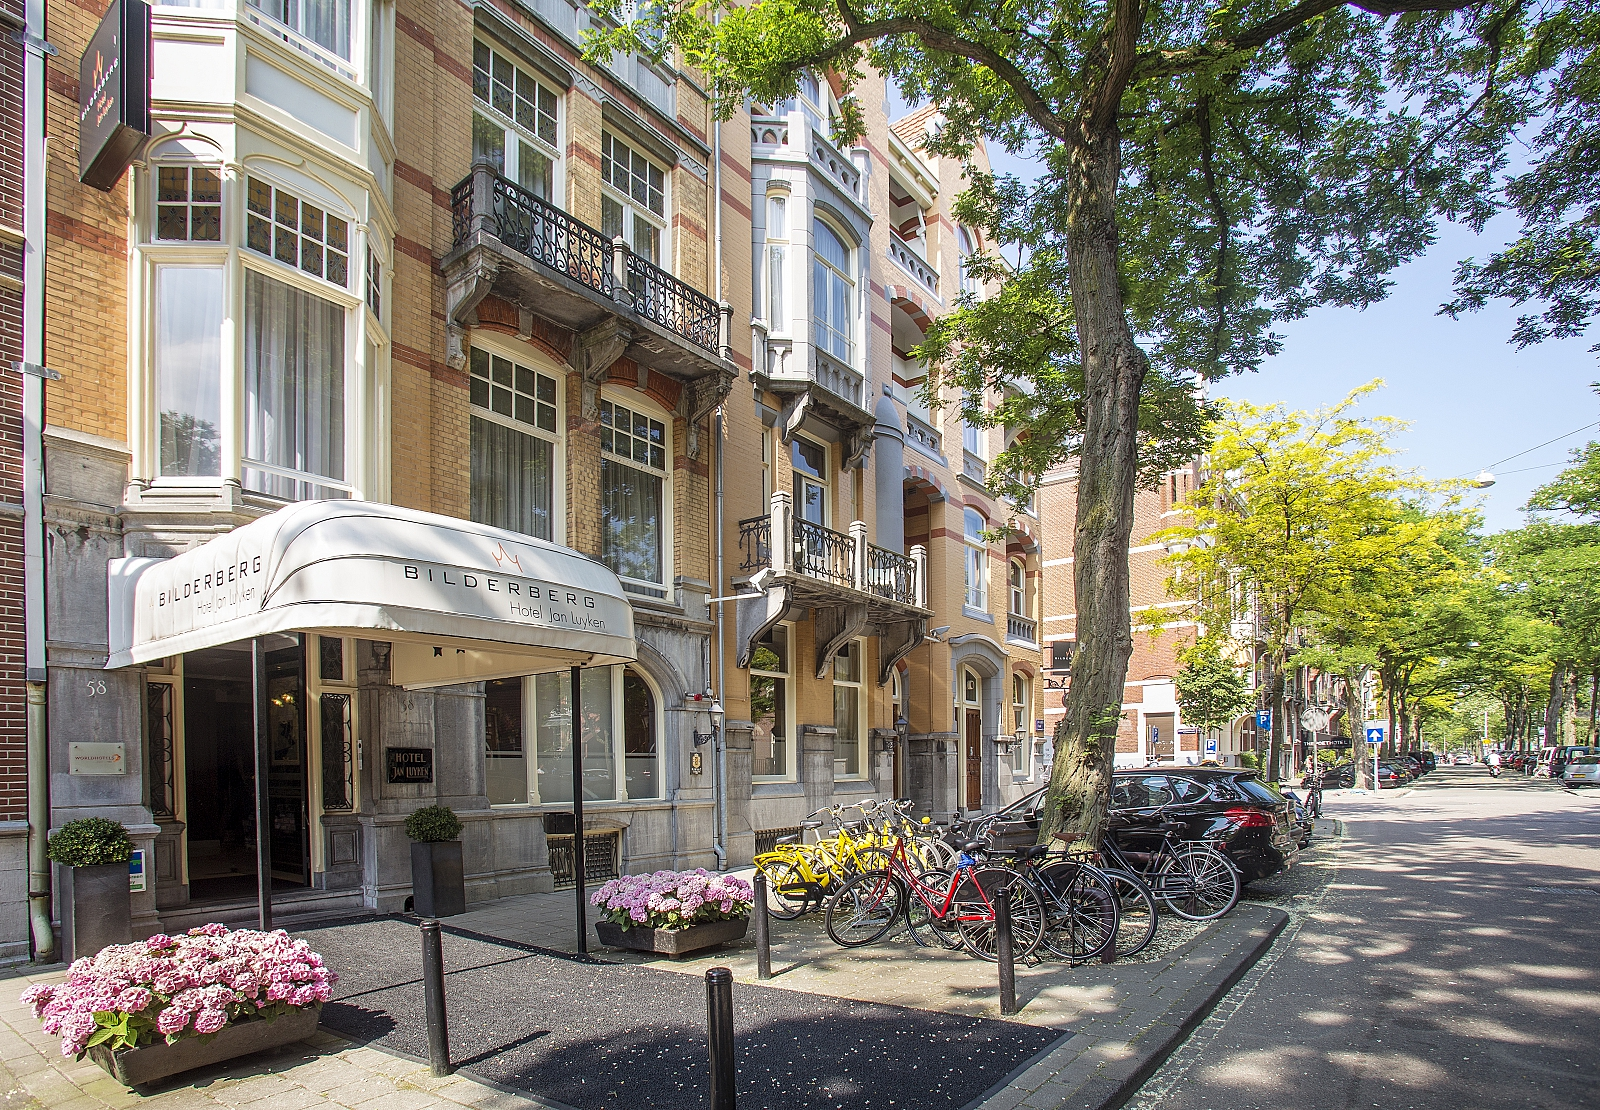 Bilderberg Hotel Jan Luyken Amsterdam